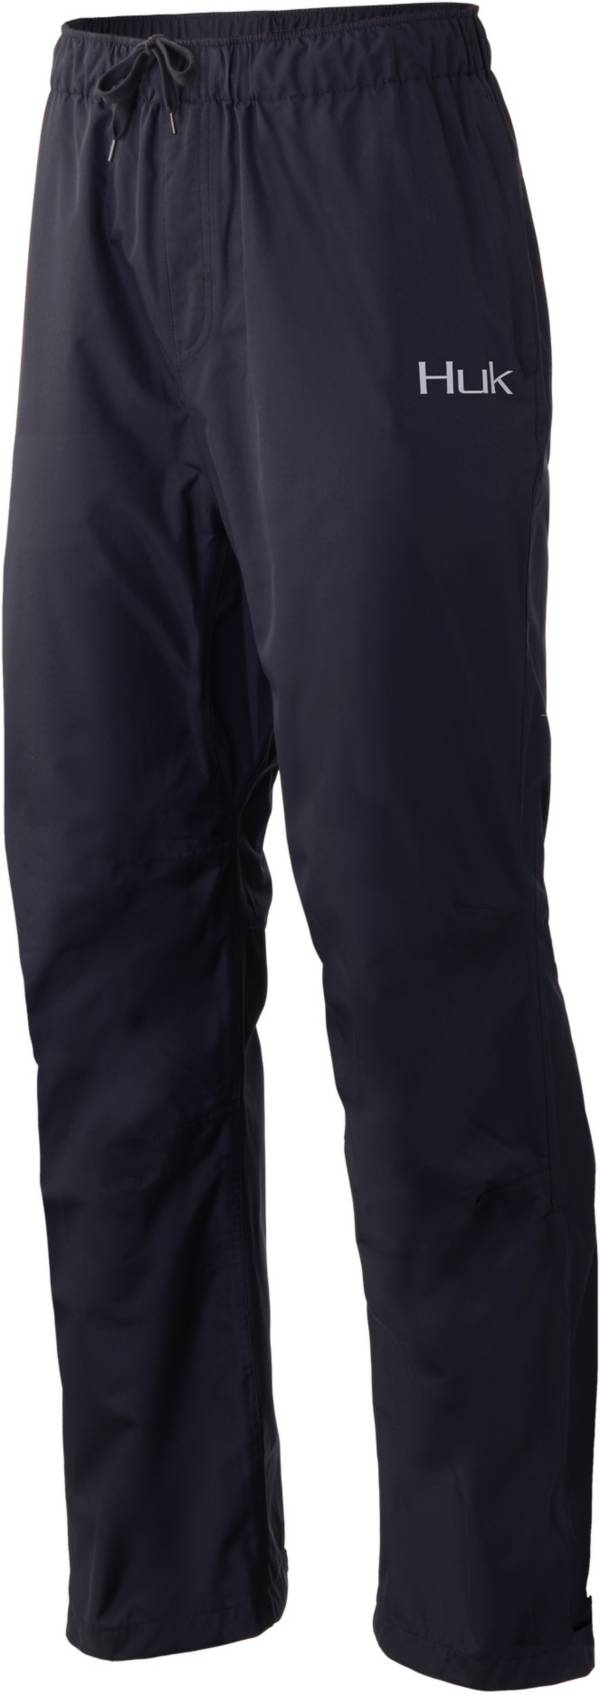 Huk Men's Gunwawle Pant product image